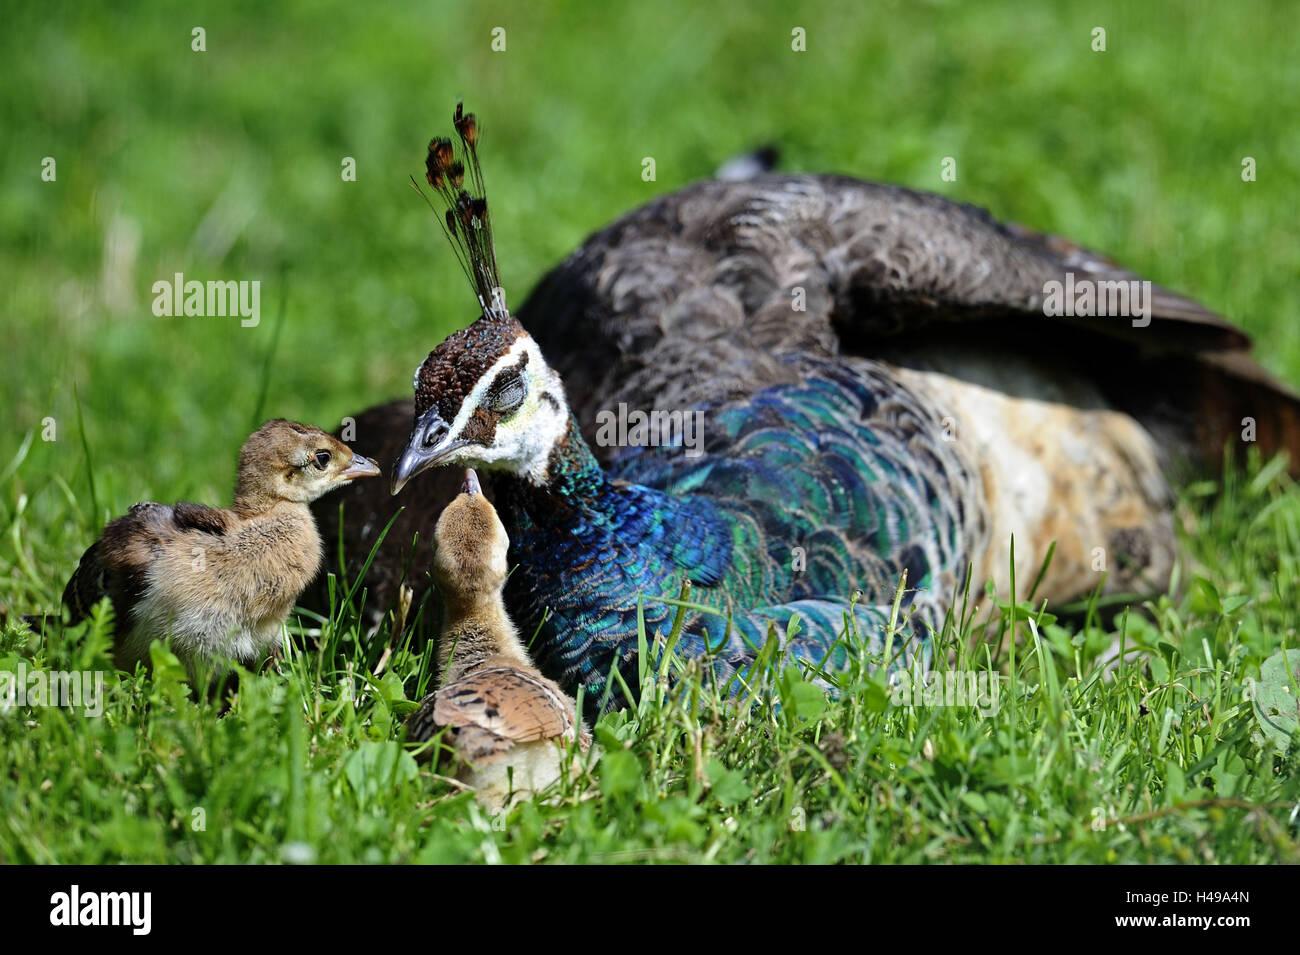 Peacock, Pavo cristatus, mother animal, rest, fledglings, meadow, Germany, habitat, gallinaceous birds, animals, - Stock Image